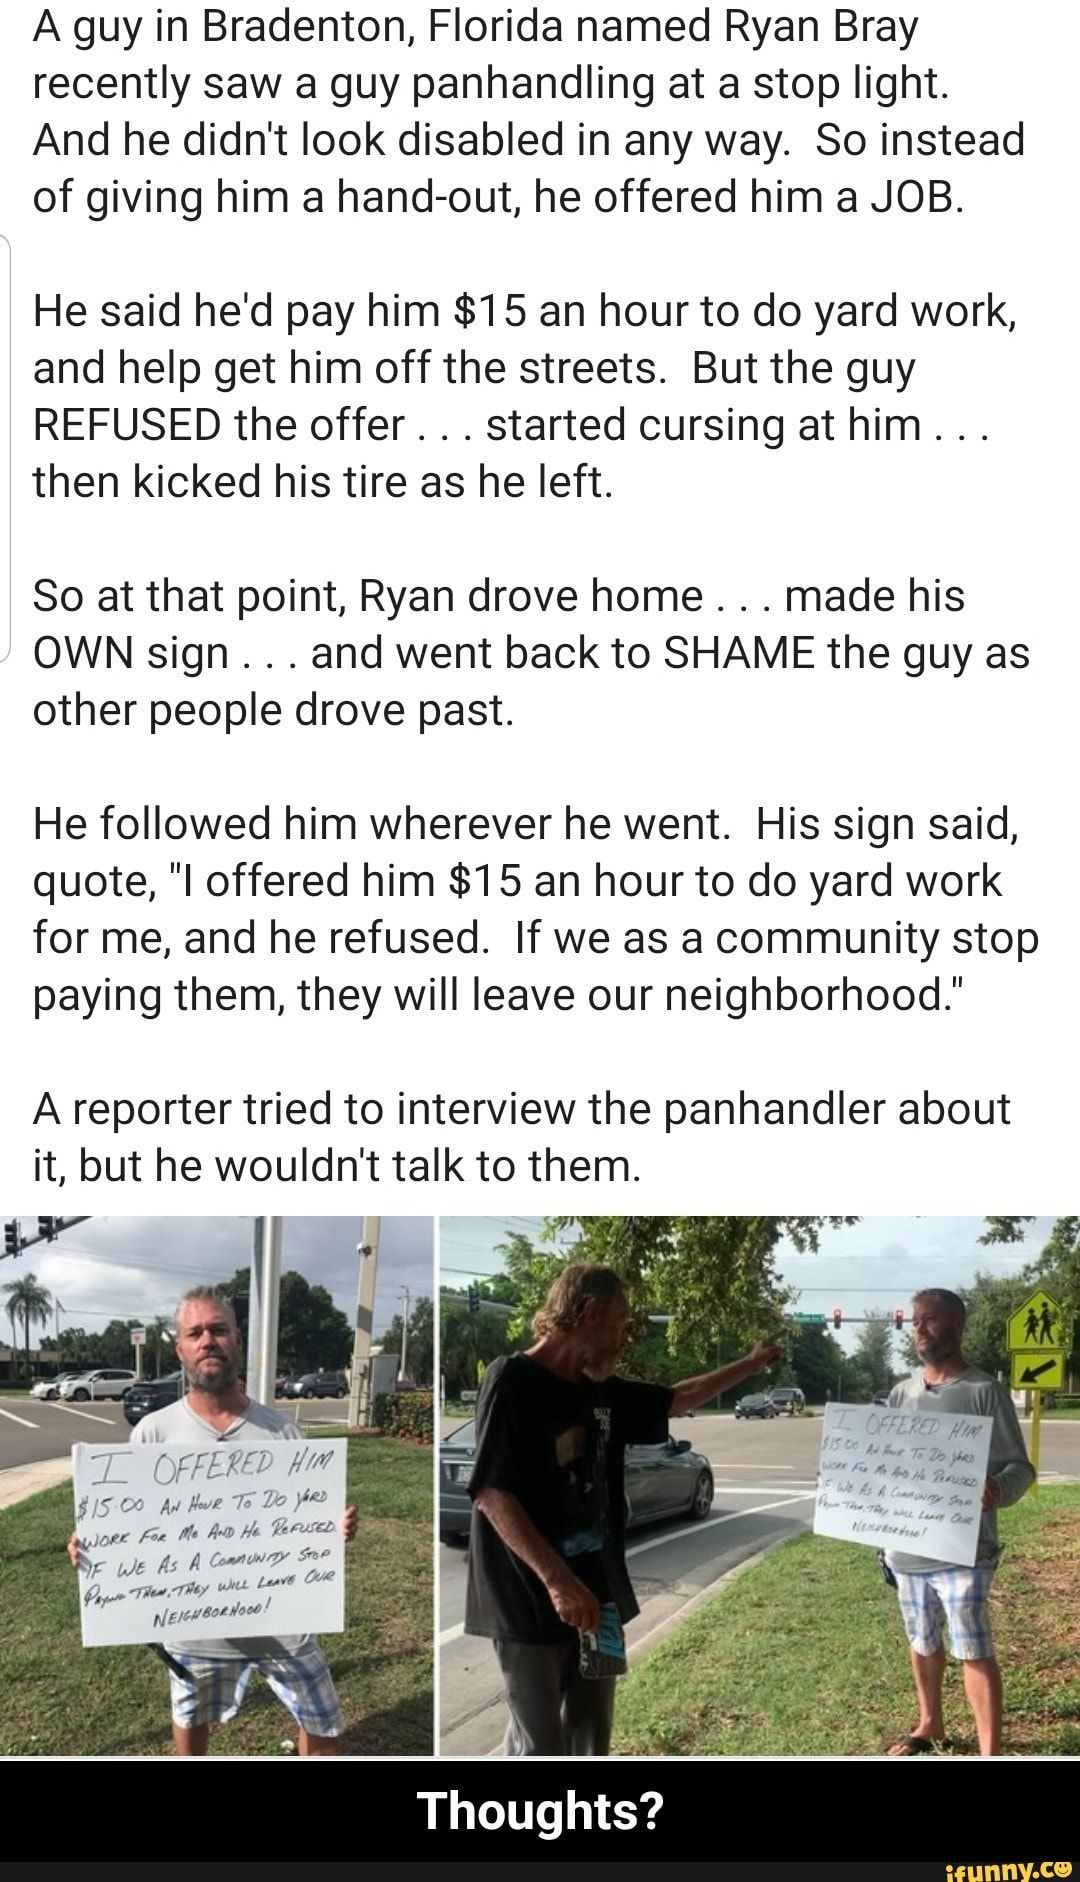 A guy in bradenton florida named ryan bray recently saw a